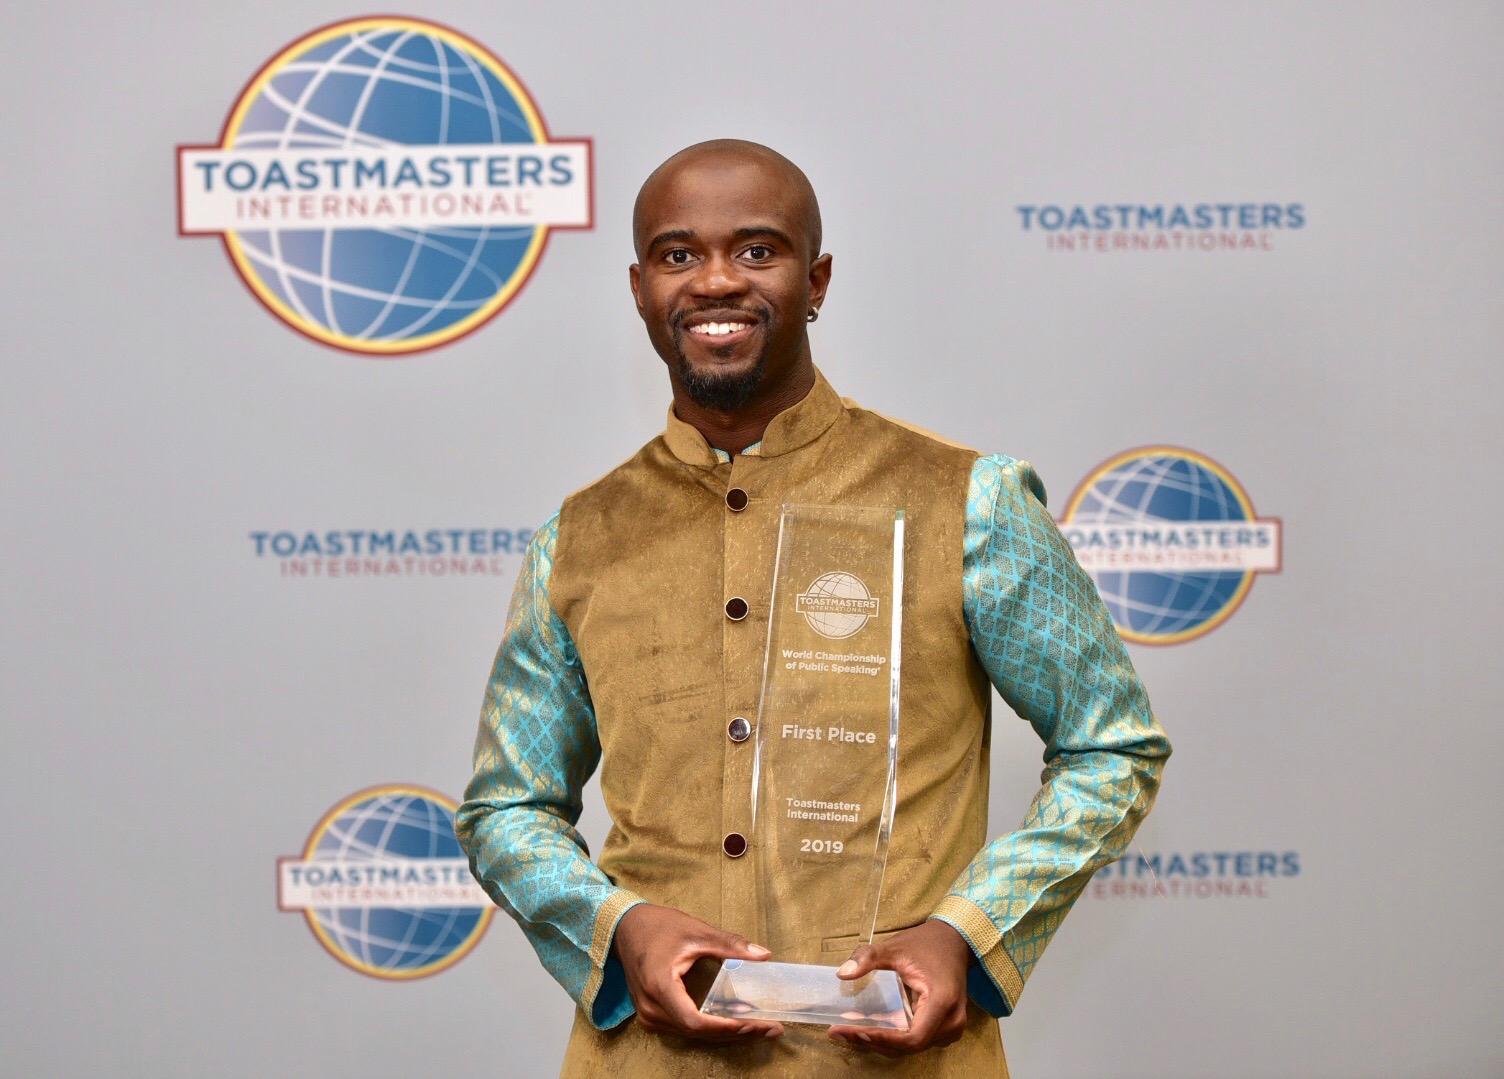 Aaron W. Beverly, 2019 World Champion of Public Speaking